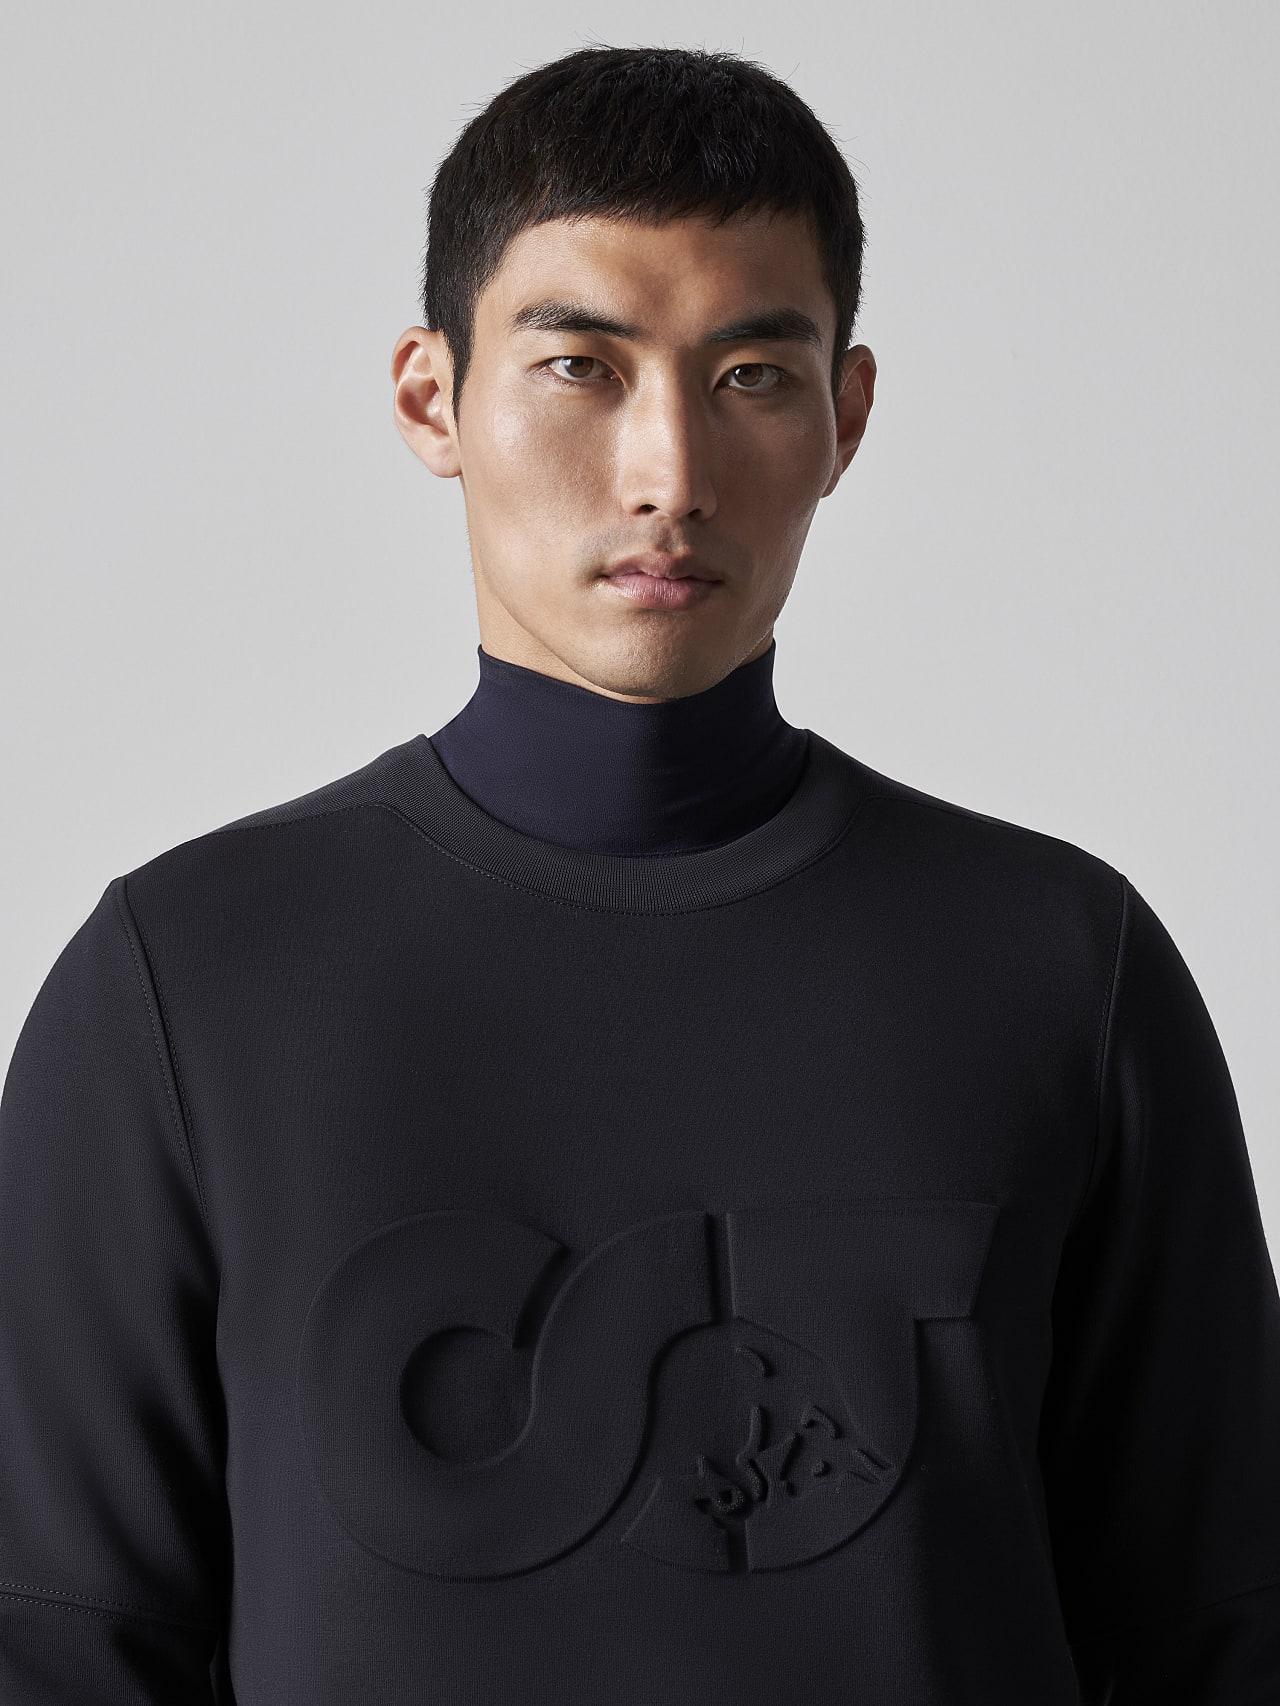 SCONA V1.Y5.02 Premium Sweatshirt black Right Alpha Tauri